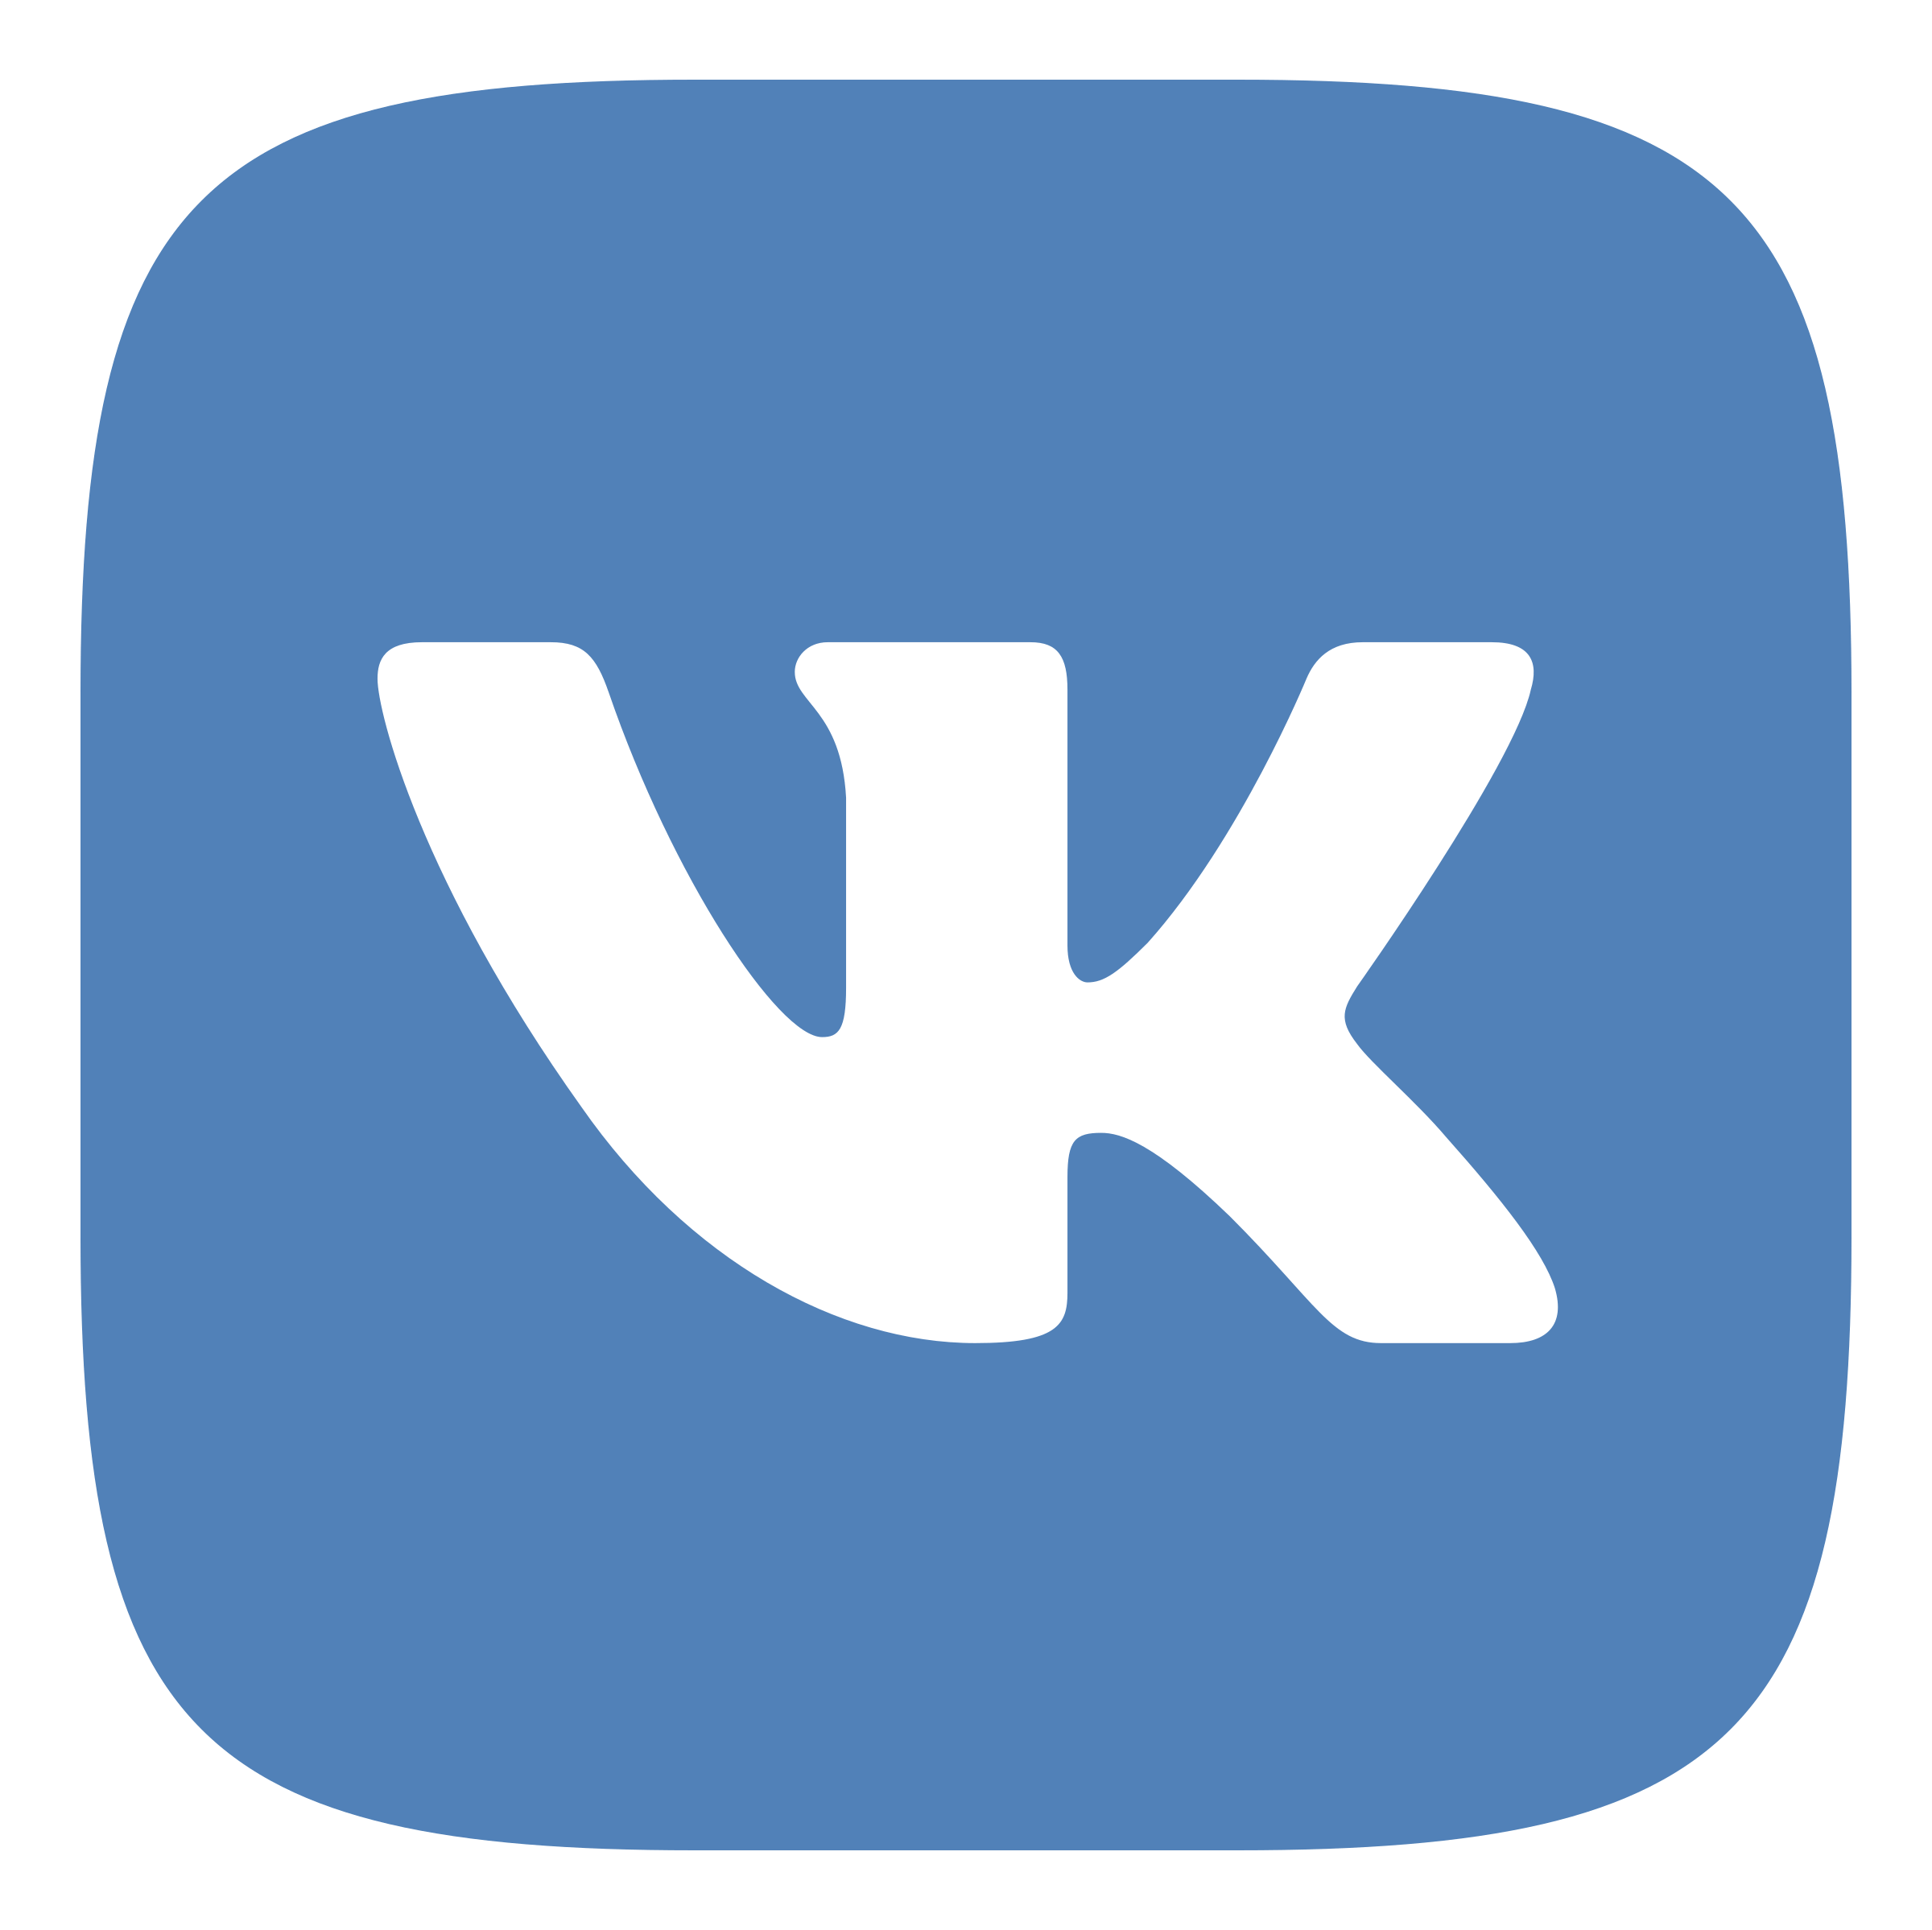 Vk logo png transparent svg vector freebie supply vk logo png toneelgroepblik Gallery